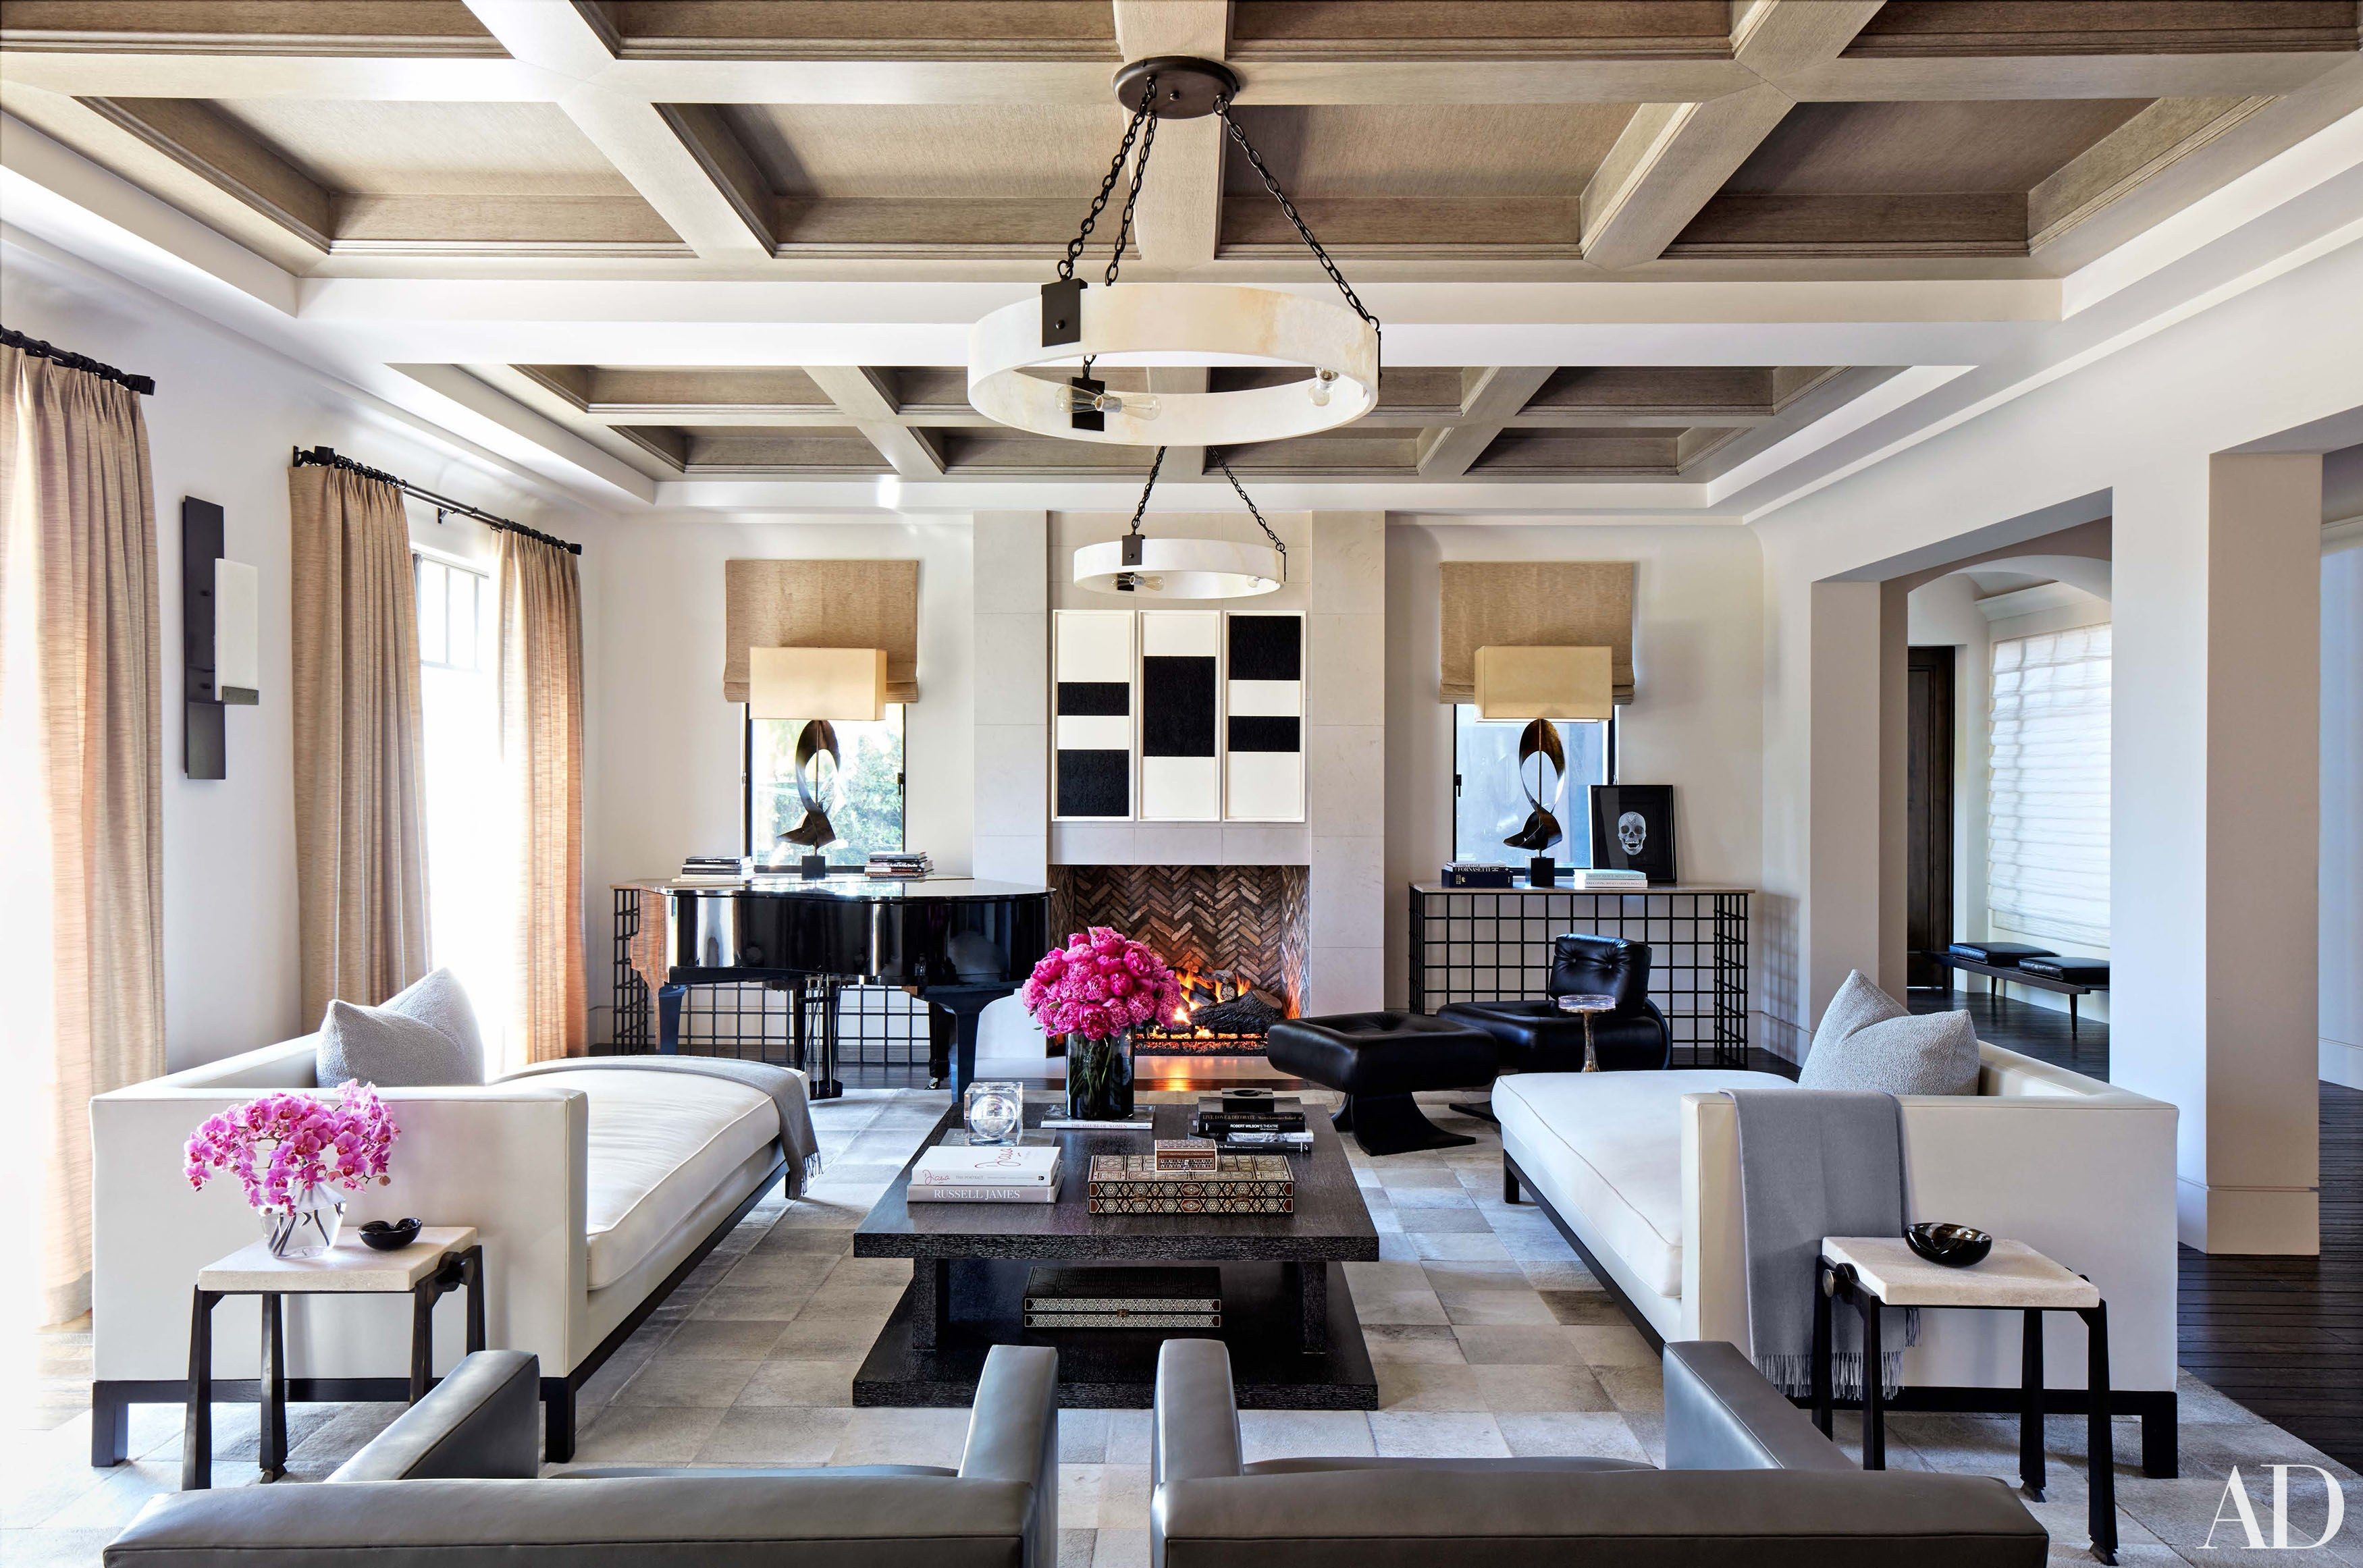 4 Things Kourtney Kardashian Loves To Collect Calabasas Homes Kourtney Kardashian House Celebrity Houses Khloe k living room